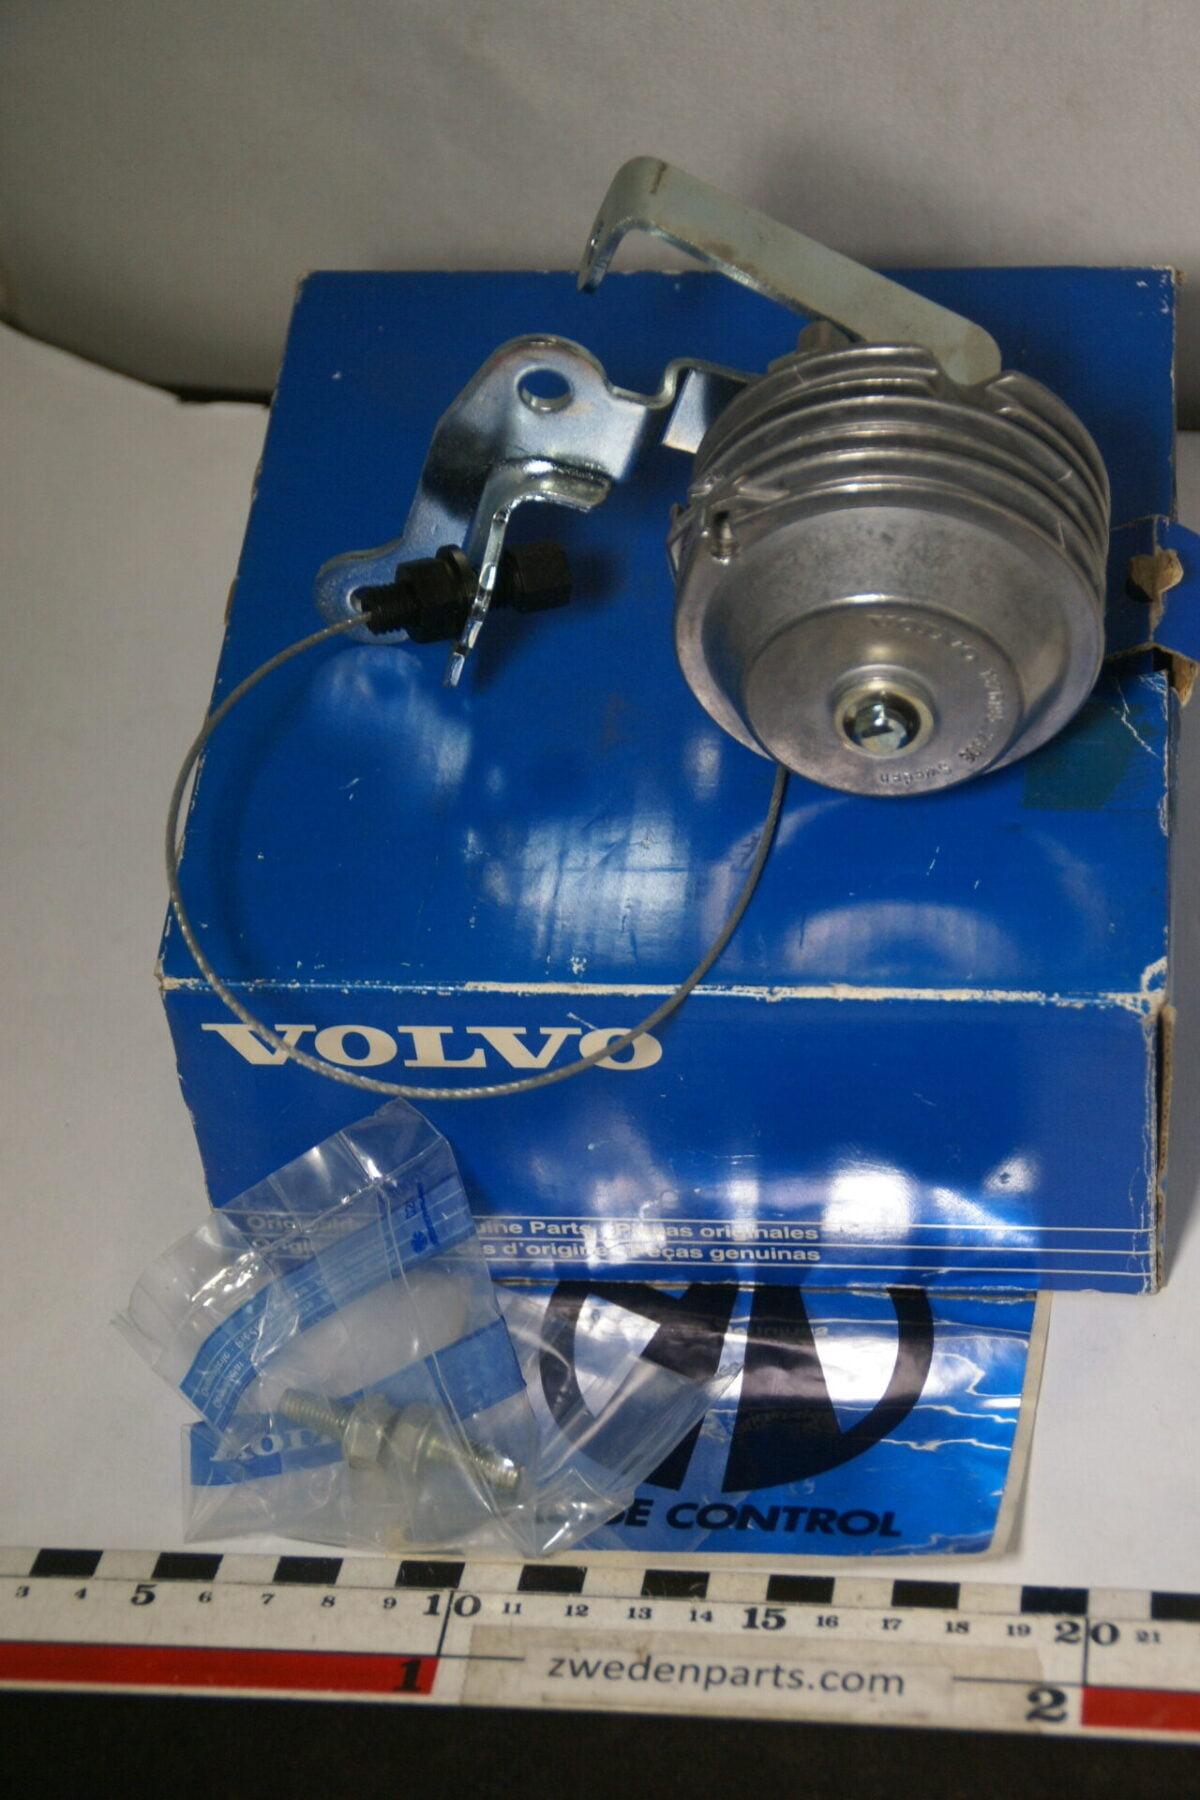 DSC05332 origineel set cruisecontrol Volvo 240 740 940 nr 3531907 NOS -e58c957b